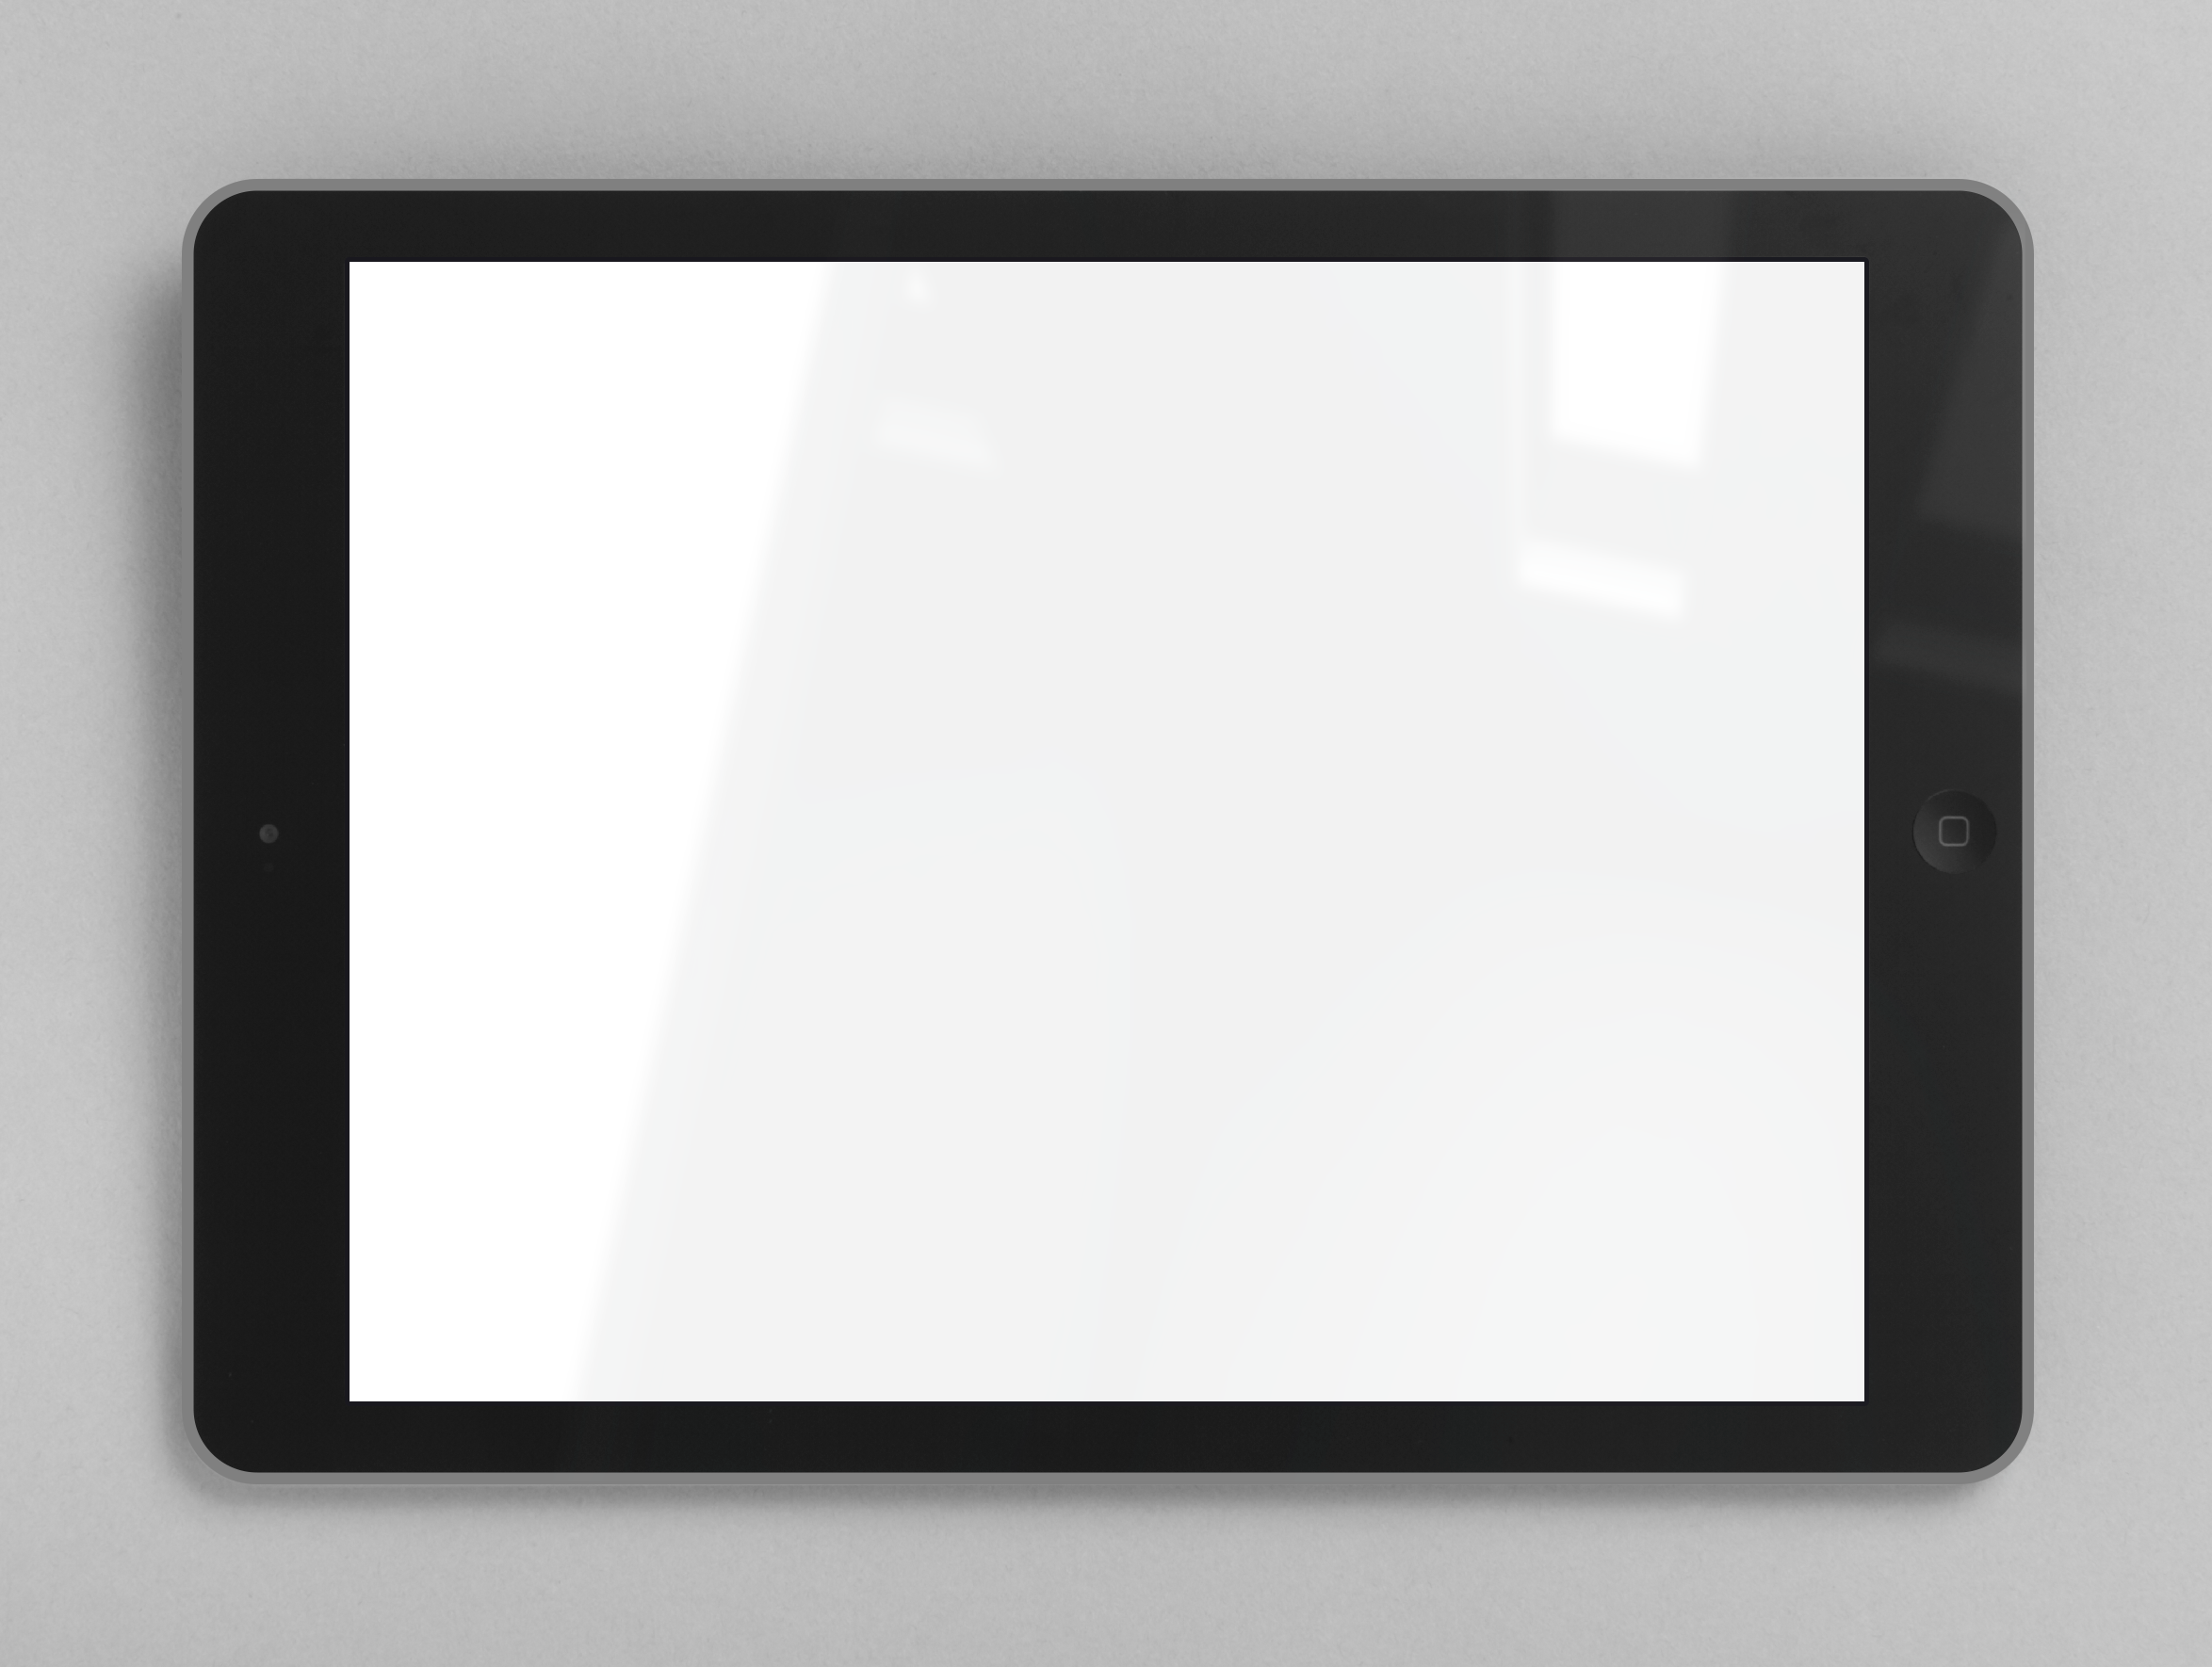 prg_ipad_frame